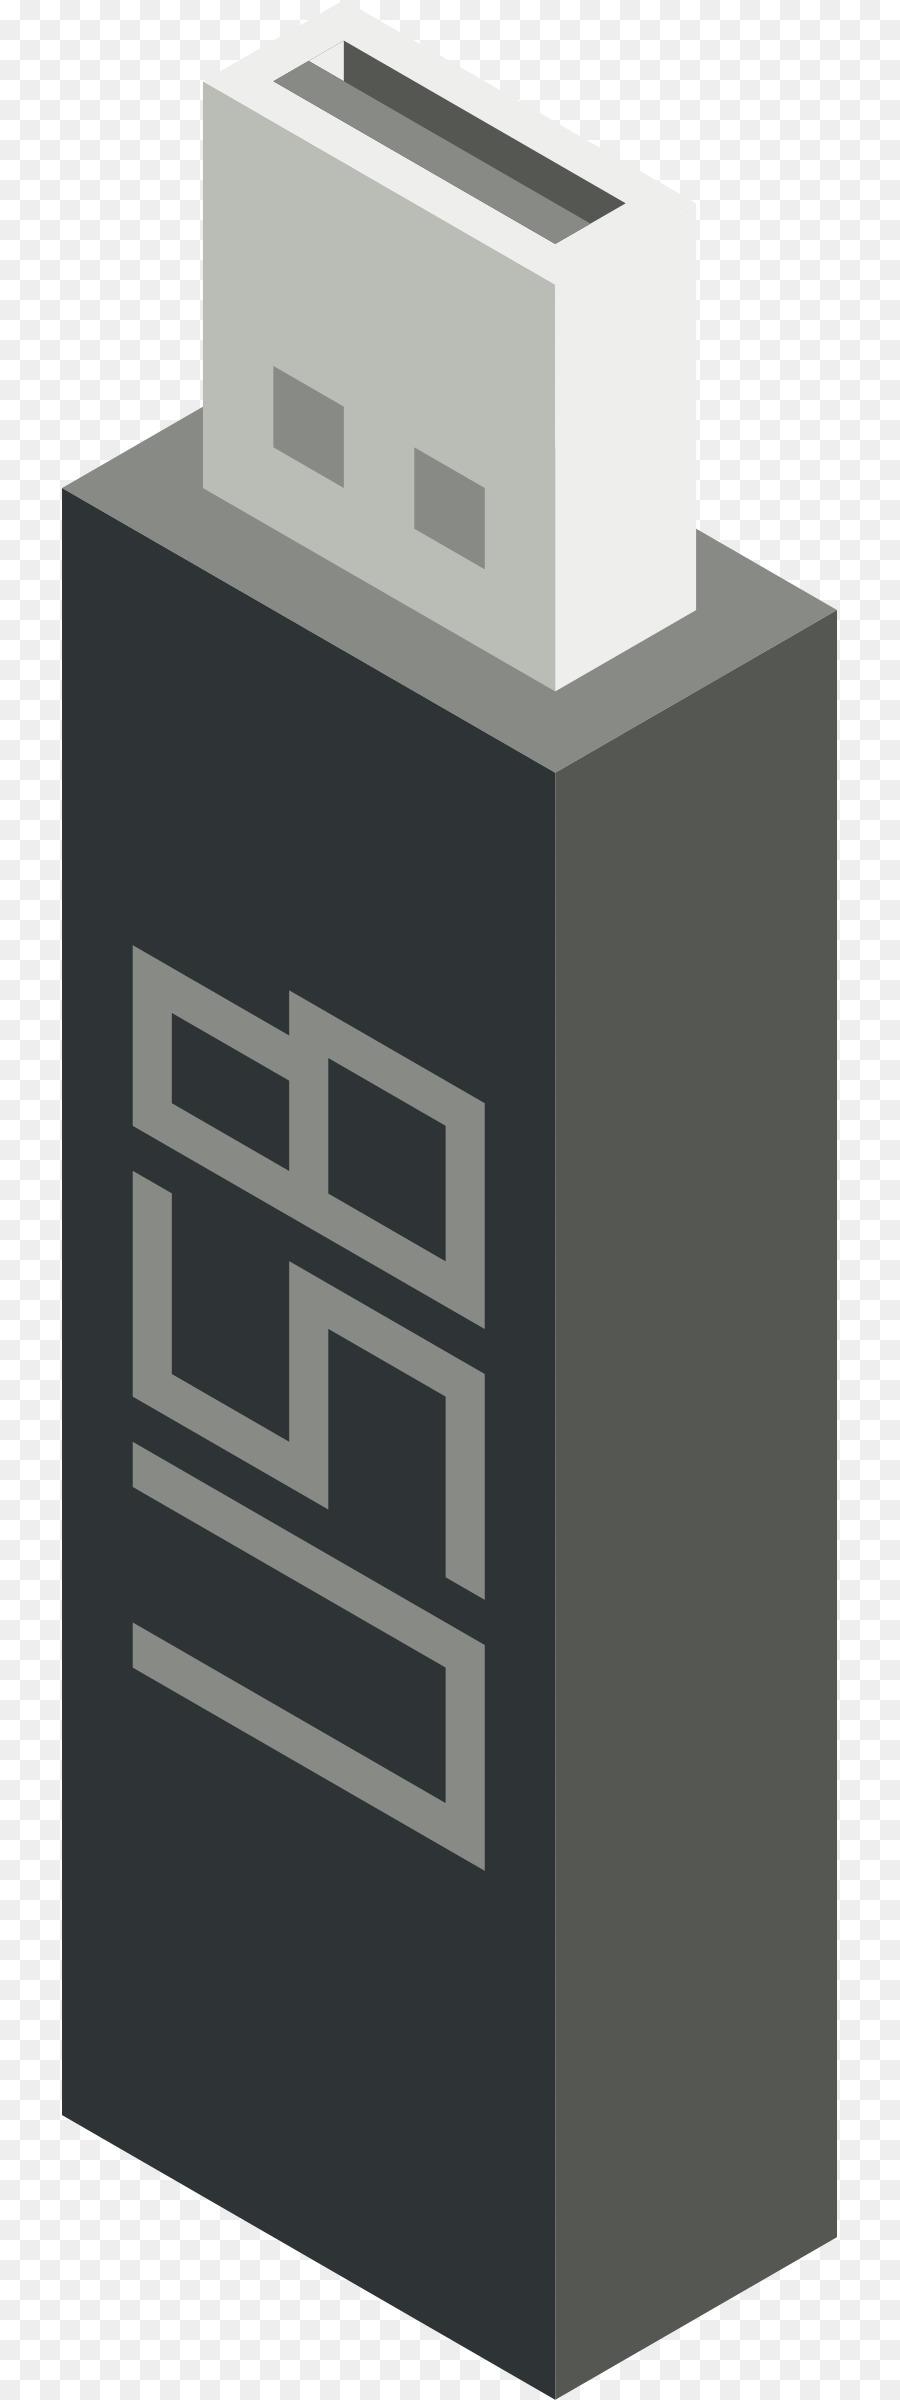 Usb Flash Drive Memory Penyimpanan Data Komputer Computer Flashdisk Atm Icons